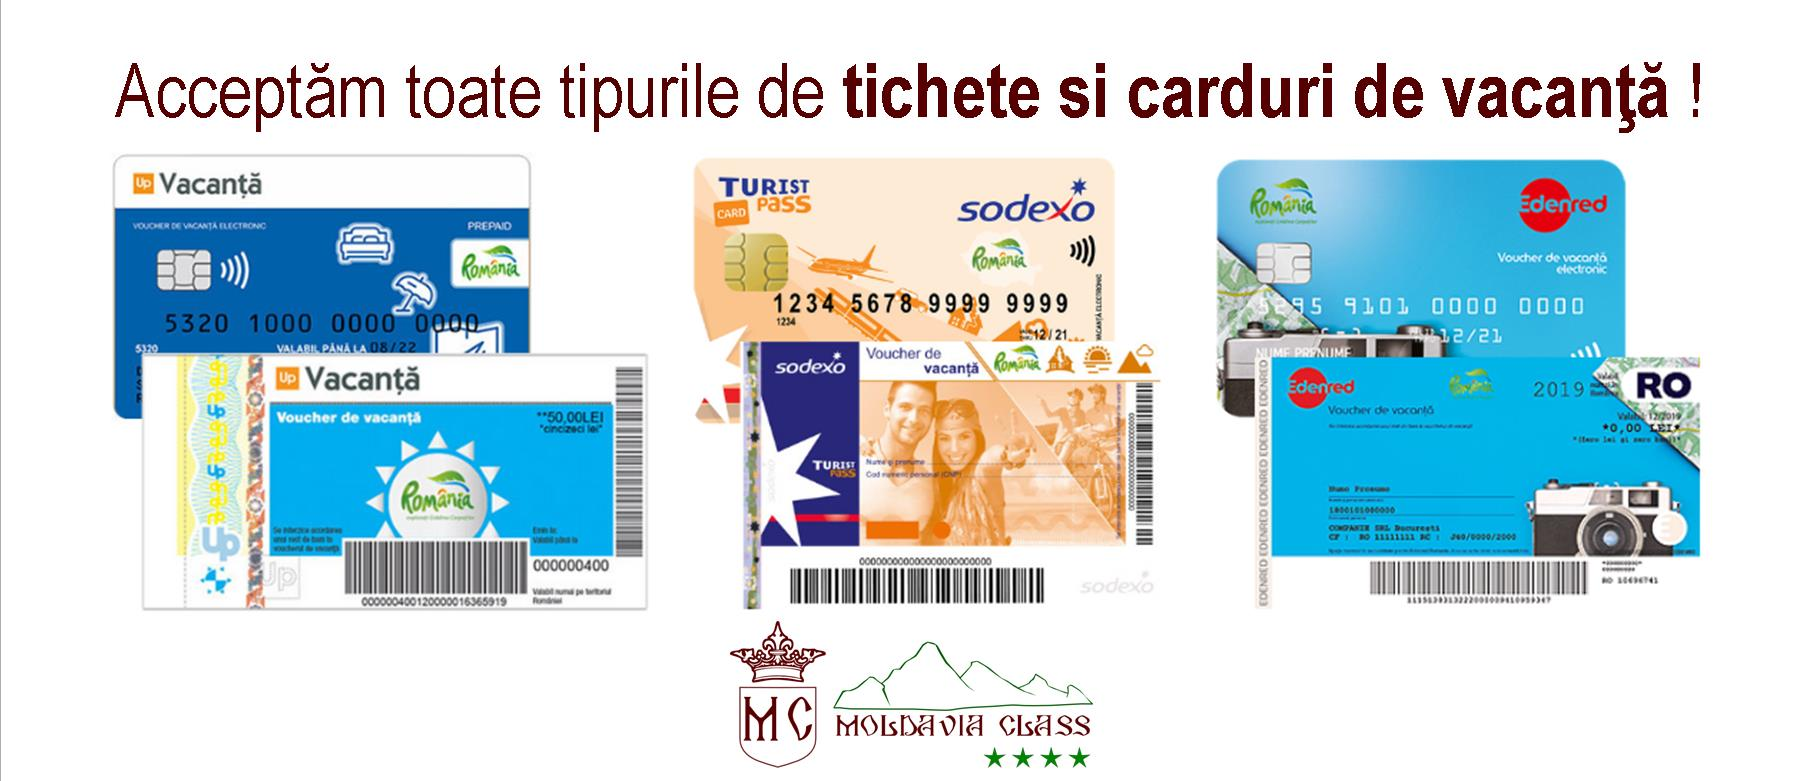 moldavia-class-accepta-plata-cu-tichete-si-carduri-de-vacanta